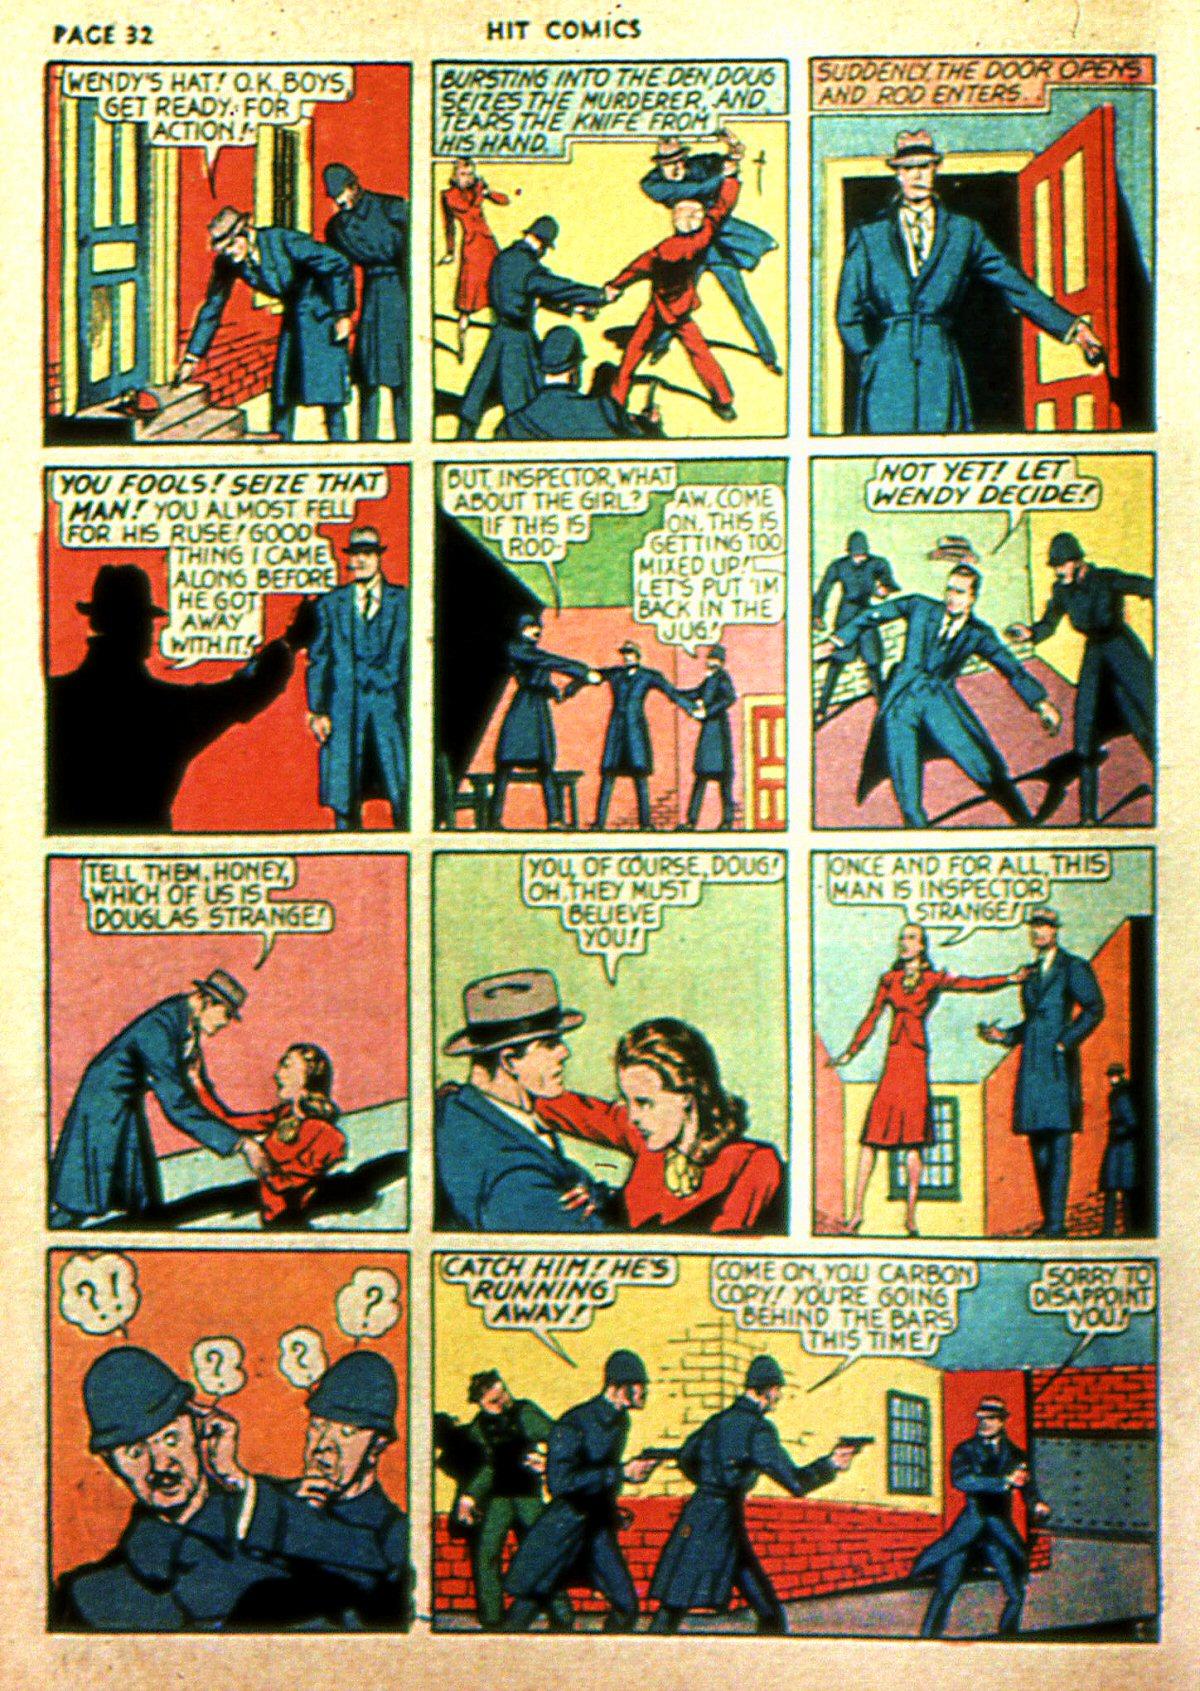 Read online Hit Comics comic -  Issue #2 - 34